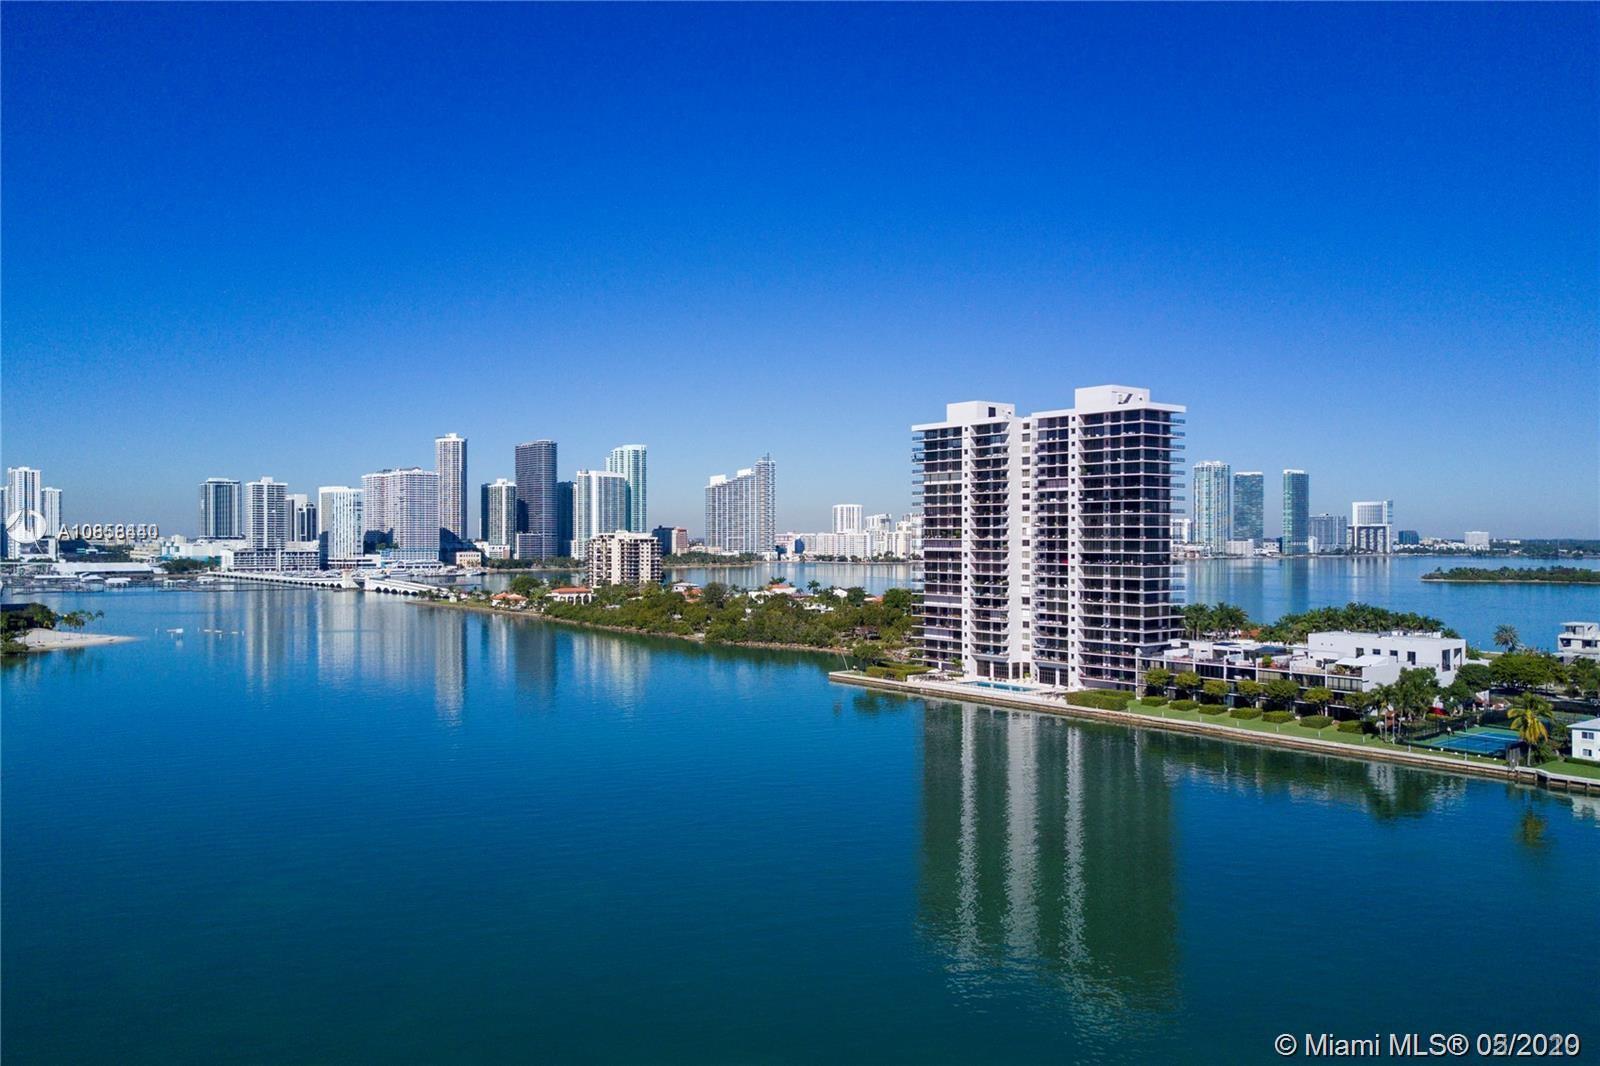 1000 Venetian Way #1701 - 1000 Venetian Way #1701, Miami, FL 33139